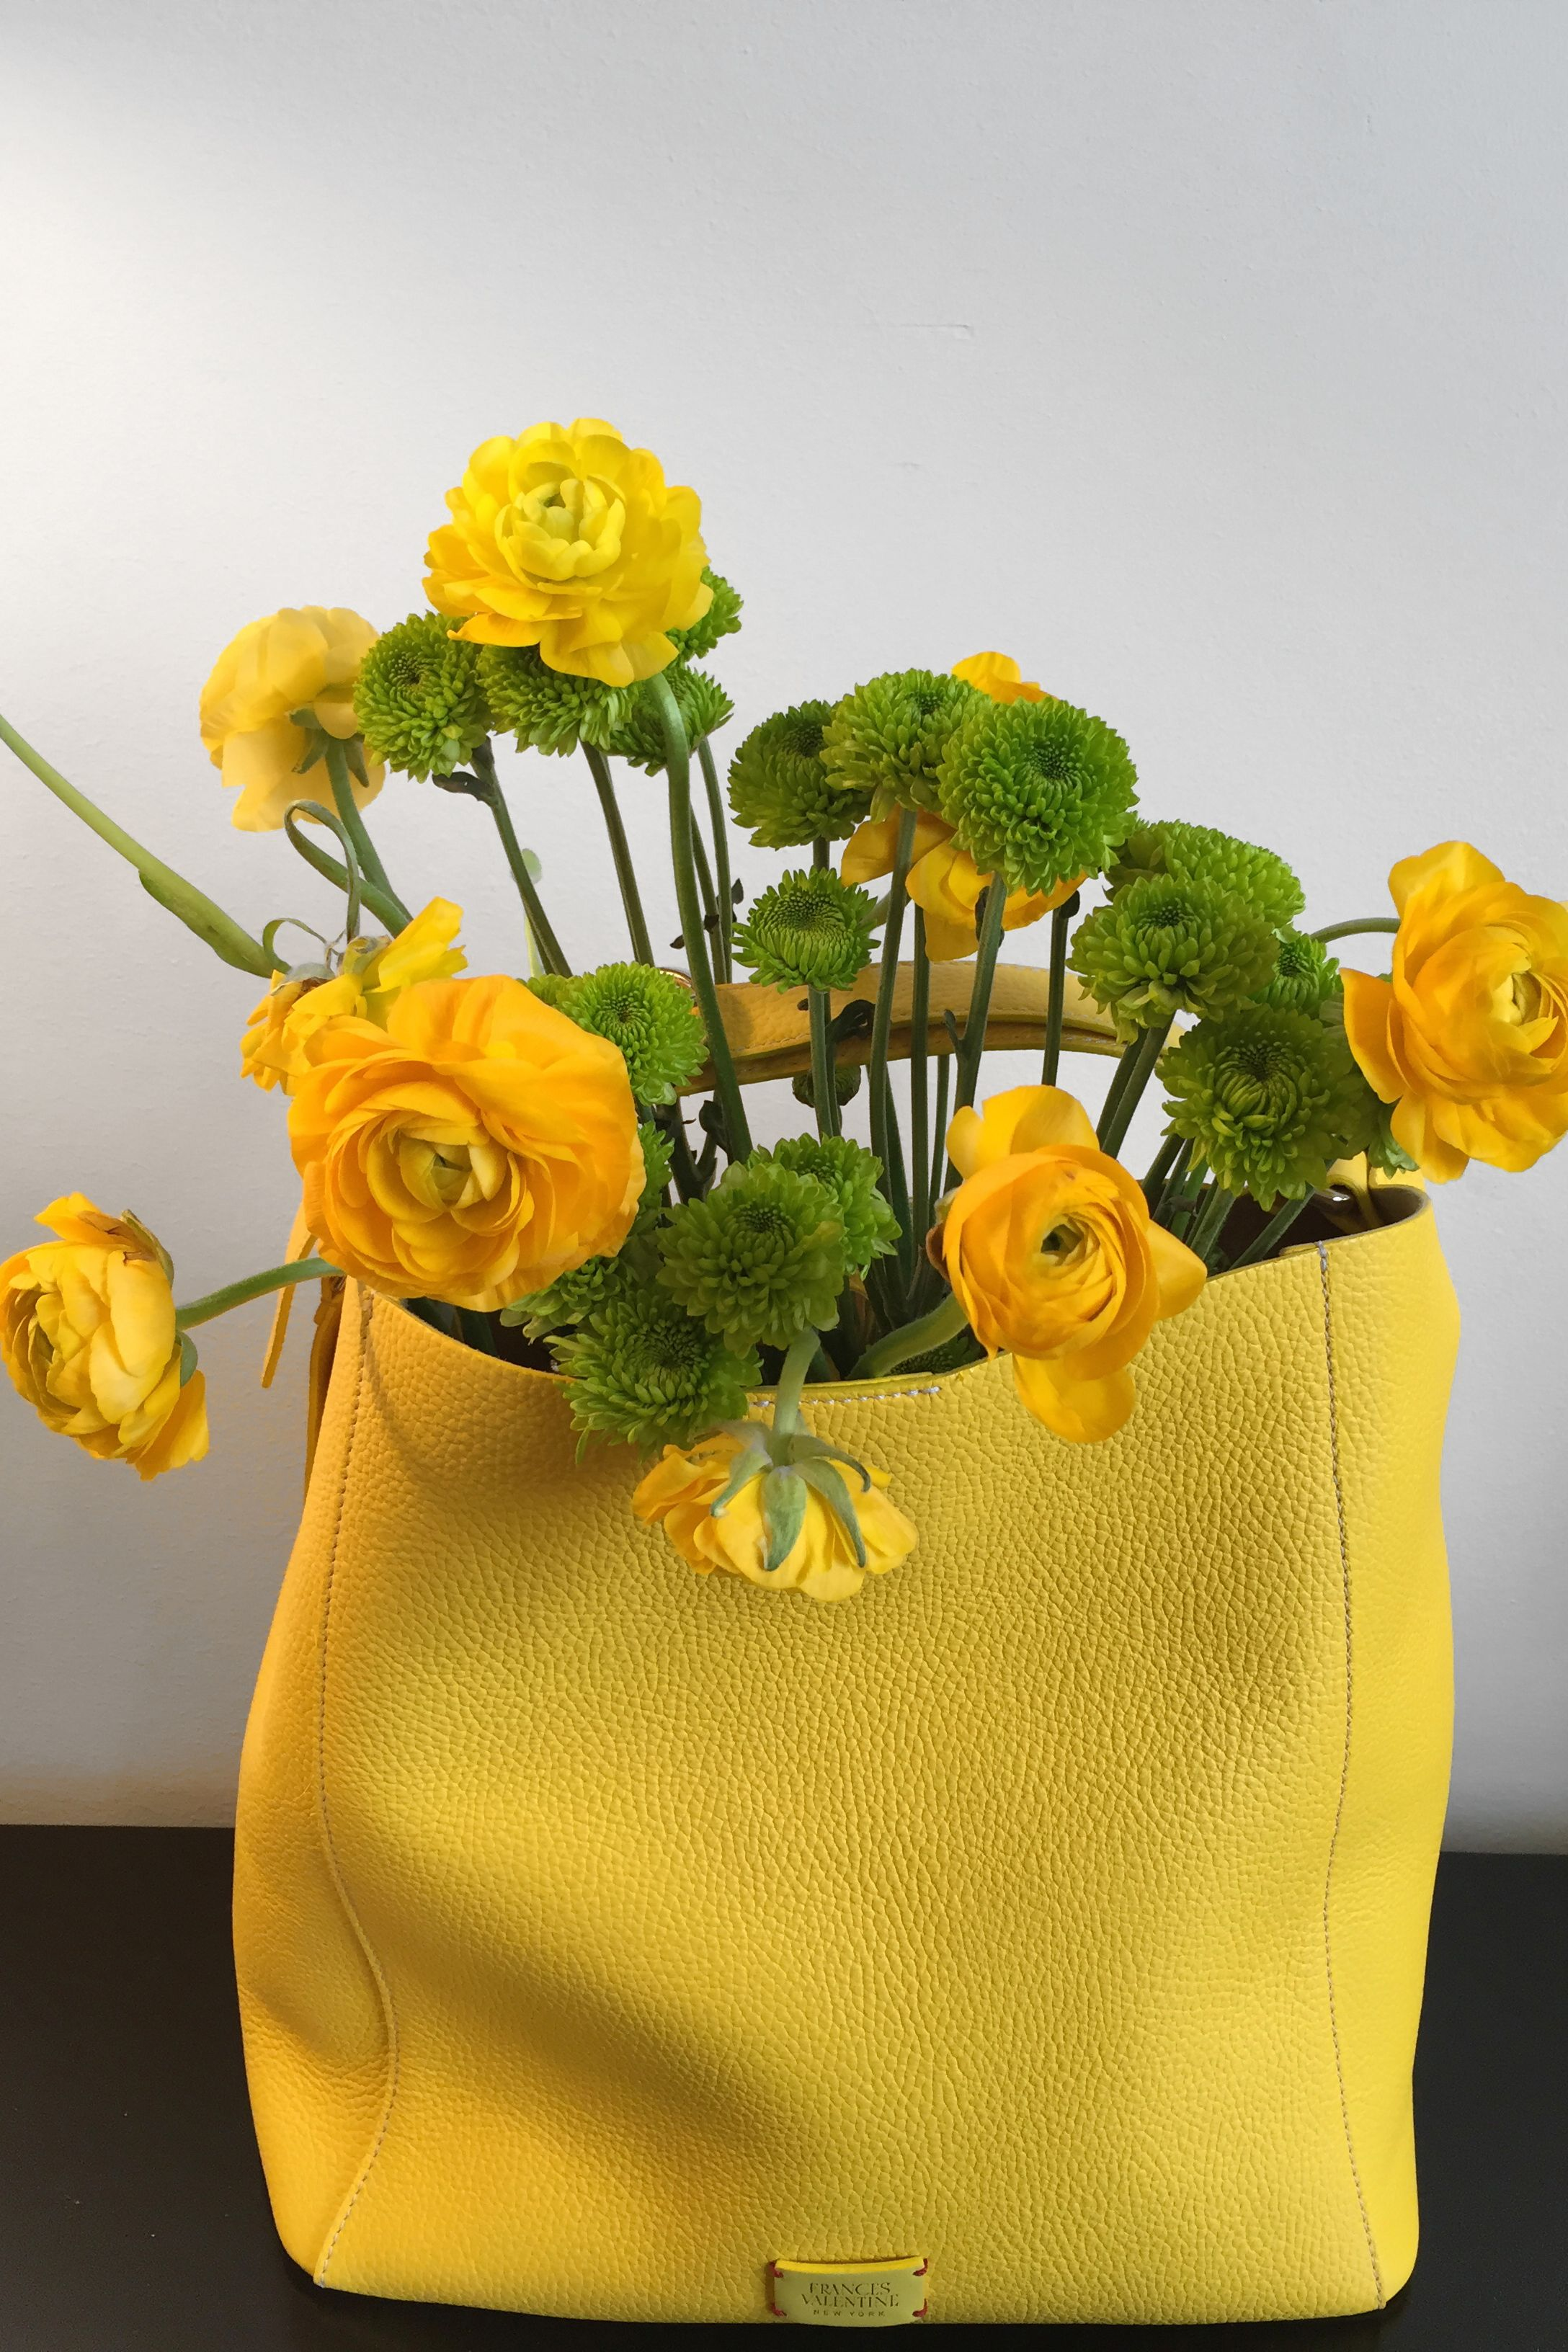 93b3b852ae Frances Valentine handbag | Darcy Miller Designs #nyfw #headoverheels  #andyspade #katespade #yellow #flowers #handbag #fashion